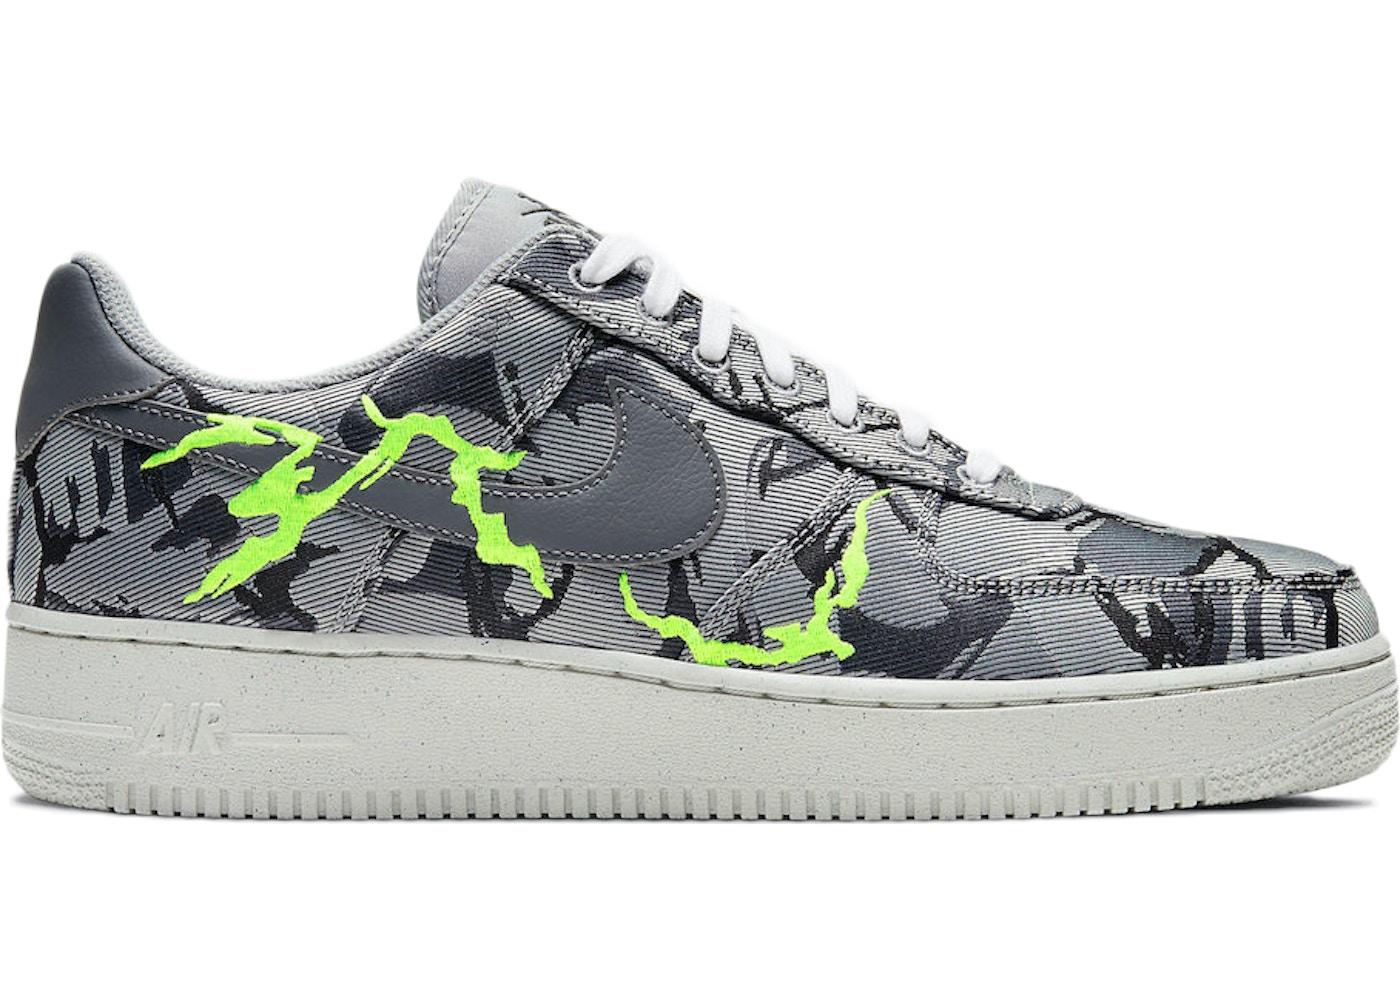 Nike Air Force 1 07 LX Light Smoke Grey Camo Embroidery